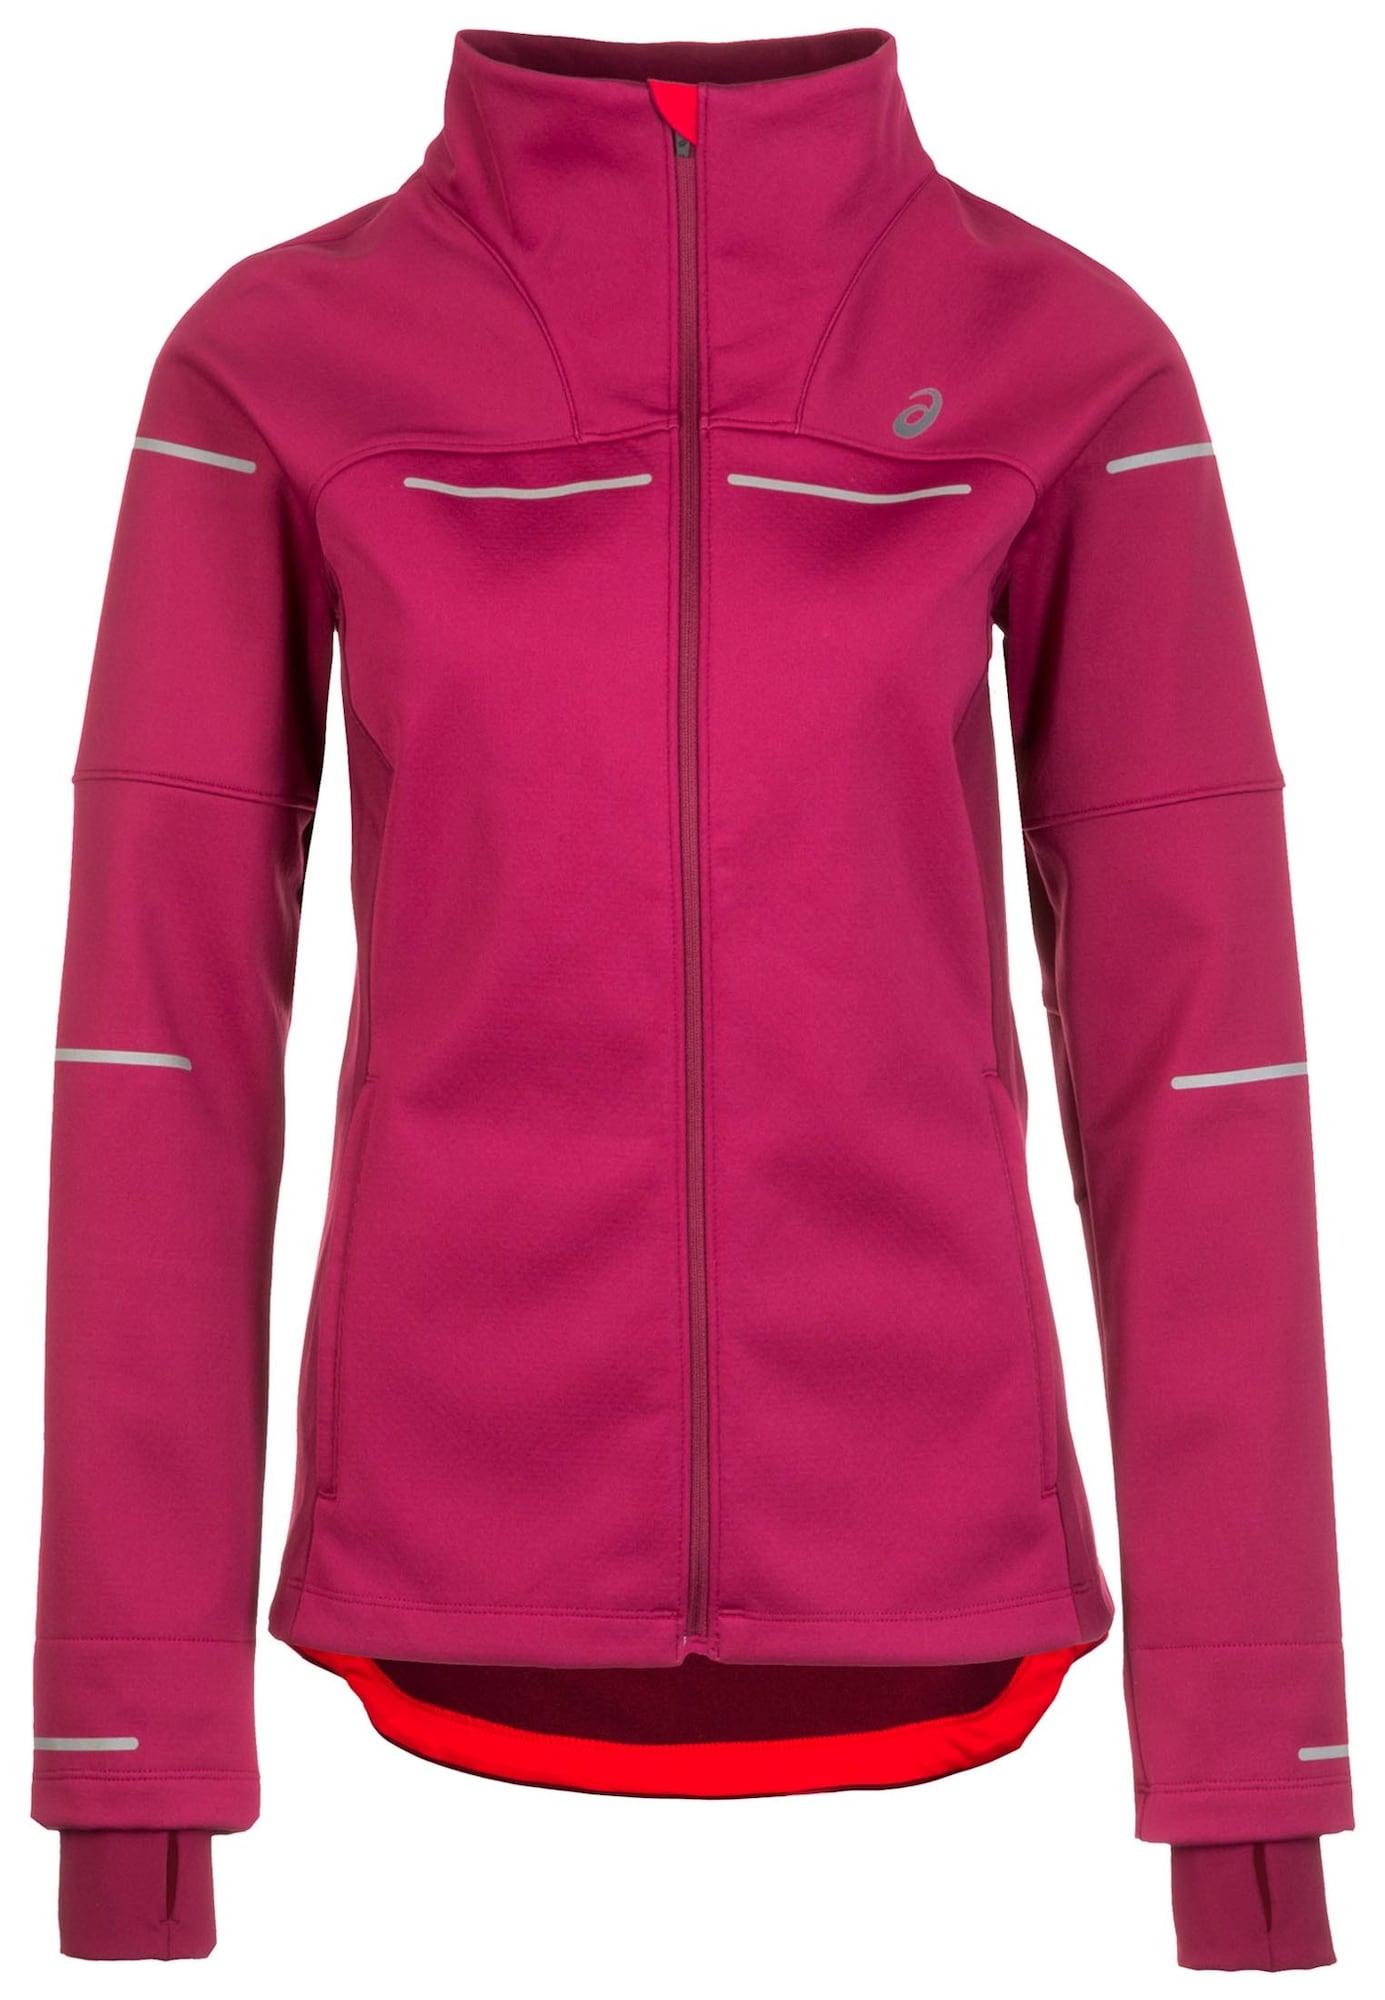 Outdoorová bunda LITE-SHOW pink ASICS